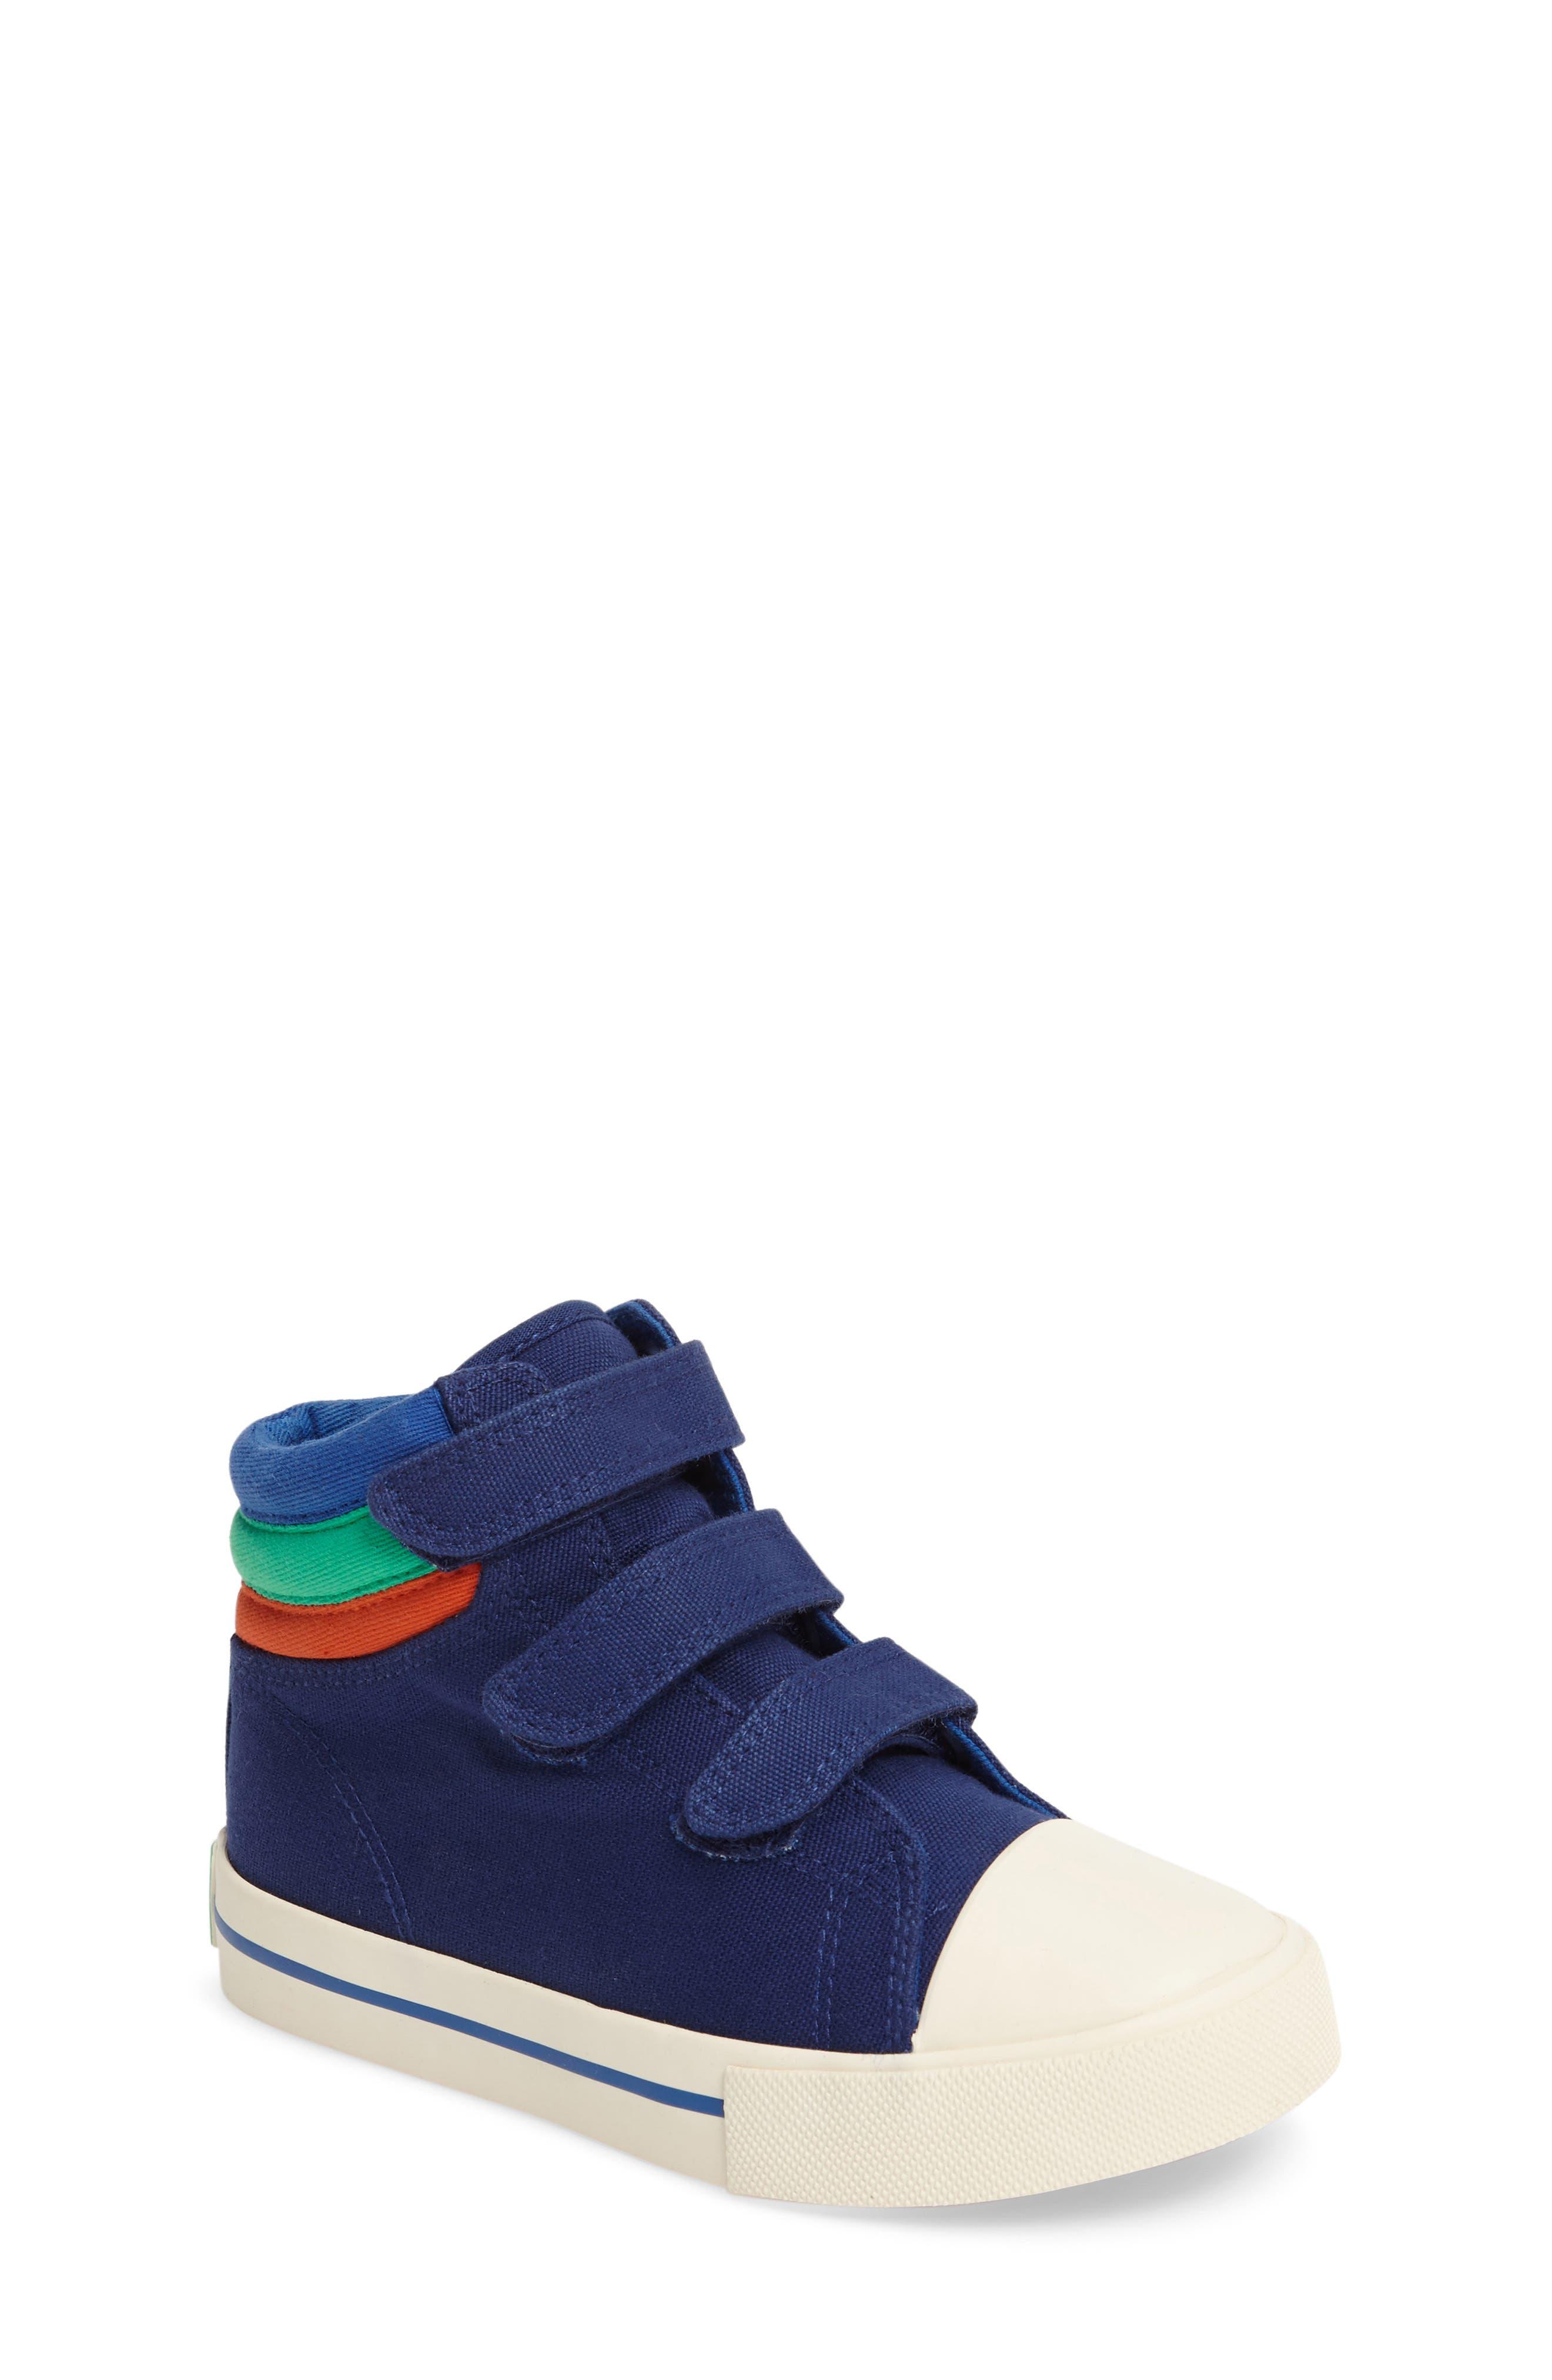 MINI BODEN High Top Sneaker